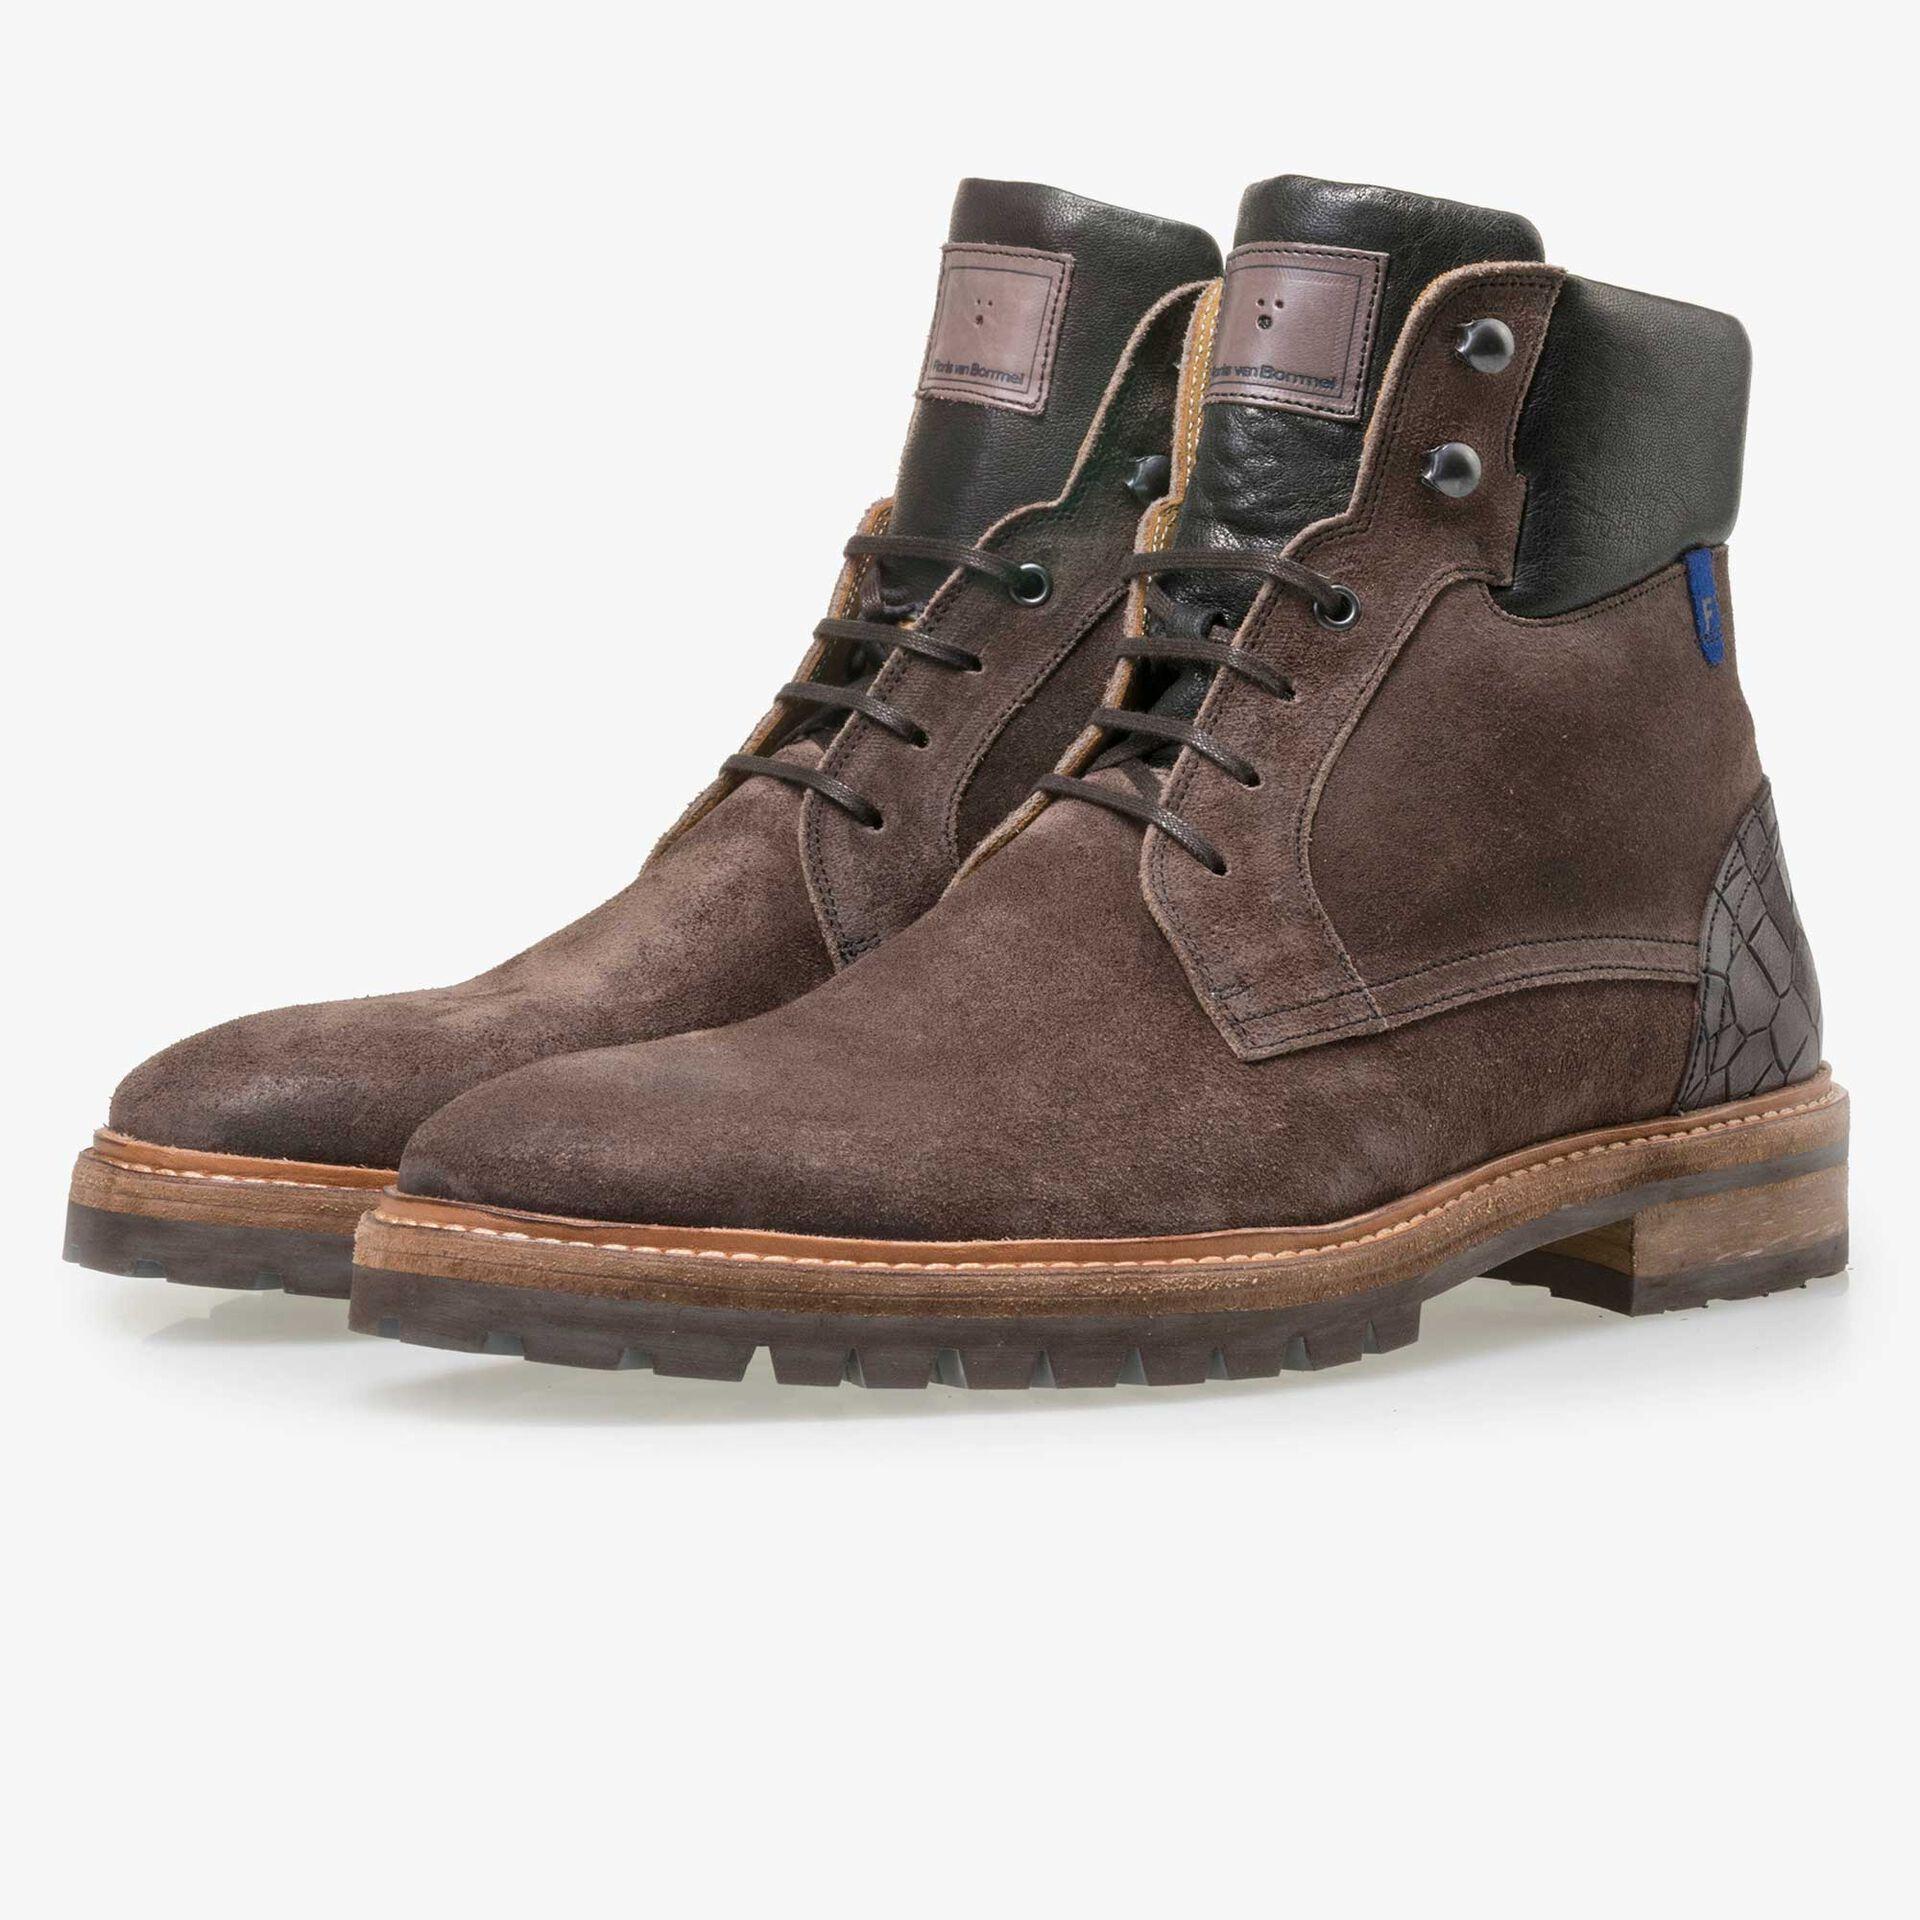 Floris van Bommel men's grey-brown suede leather lace boot